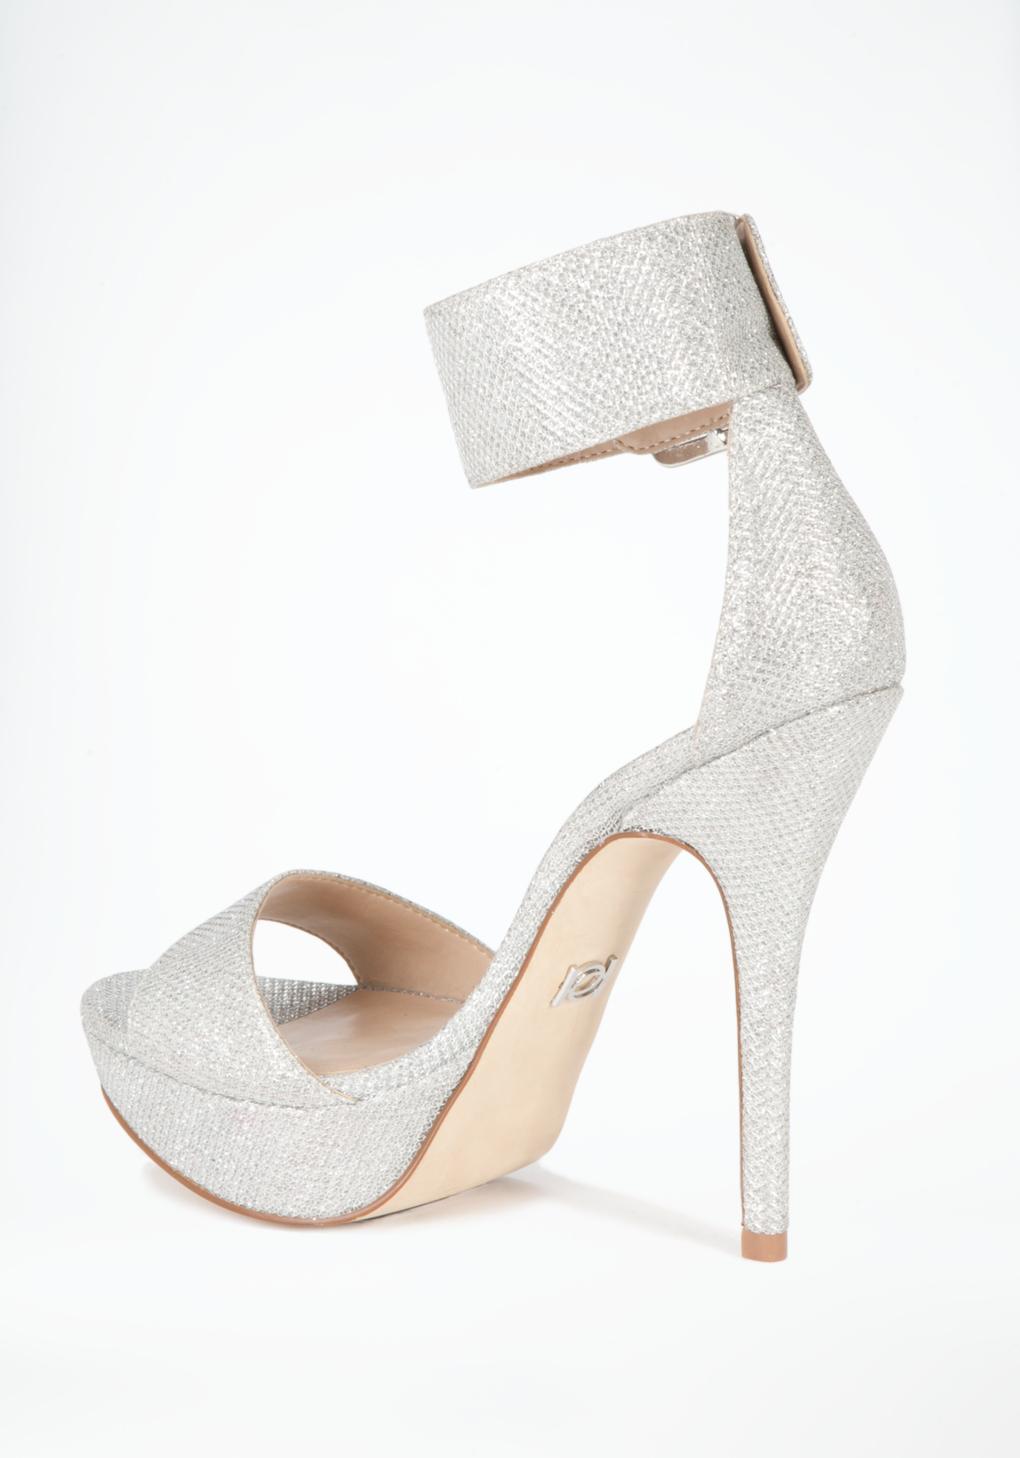 2f486311184 Lyst - Bebe Jill Glitter Mesh Ankle Sandals in White